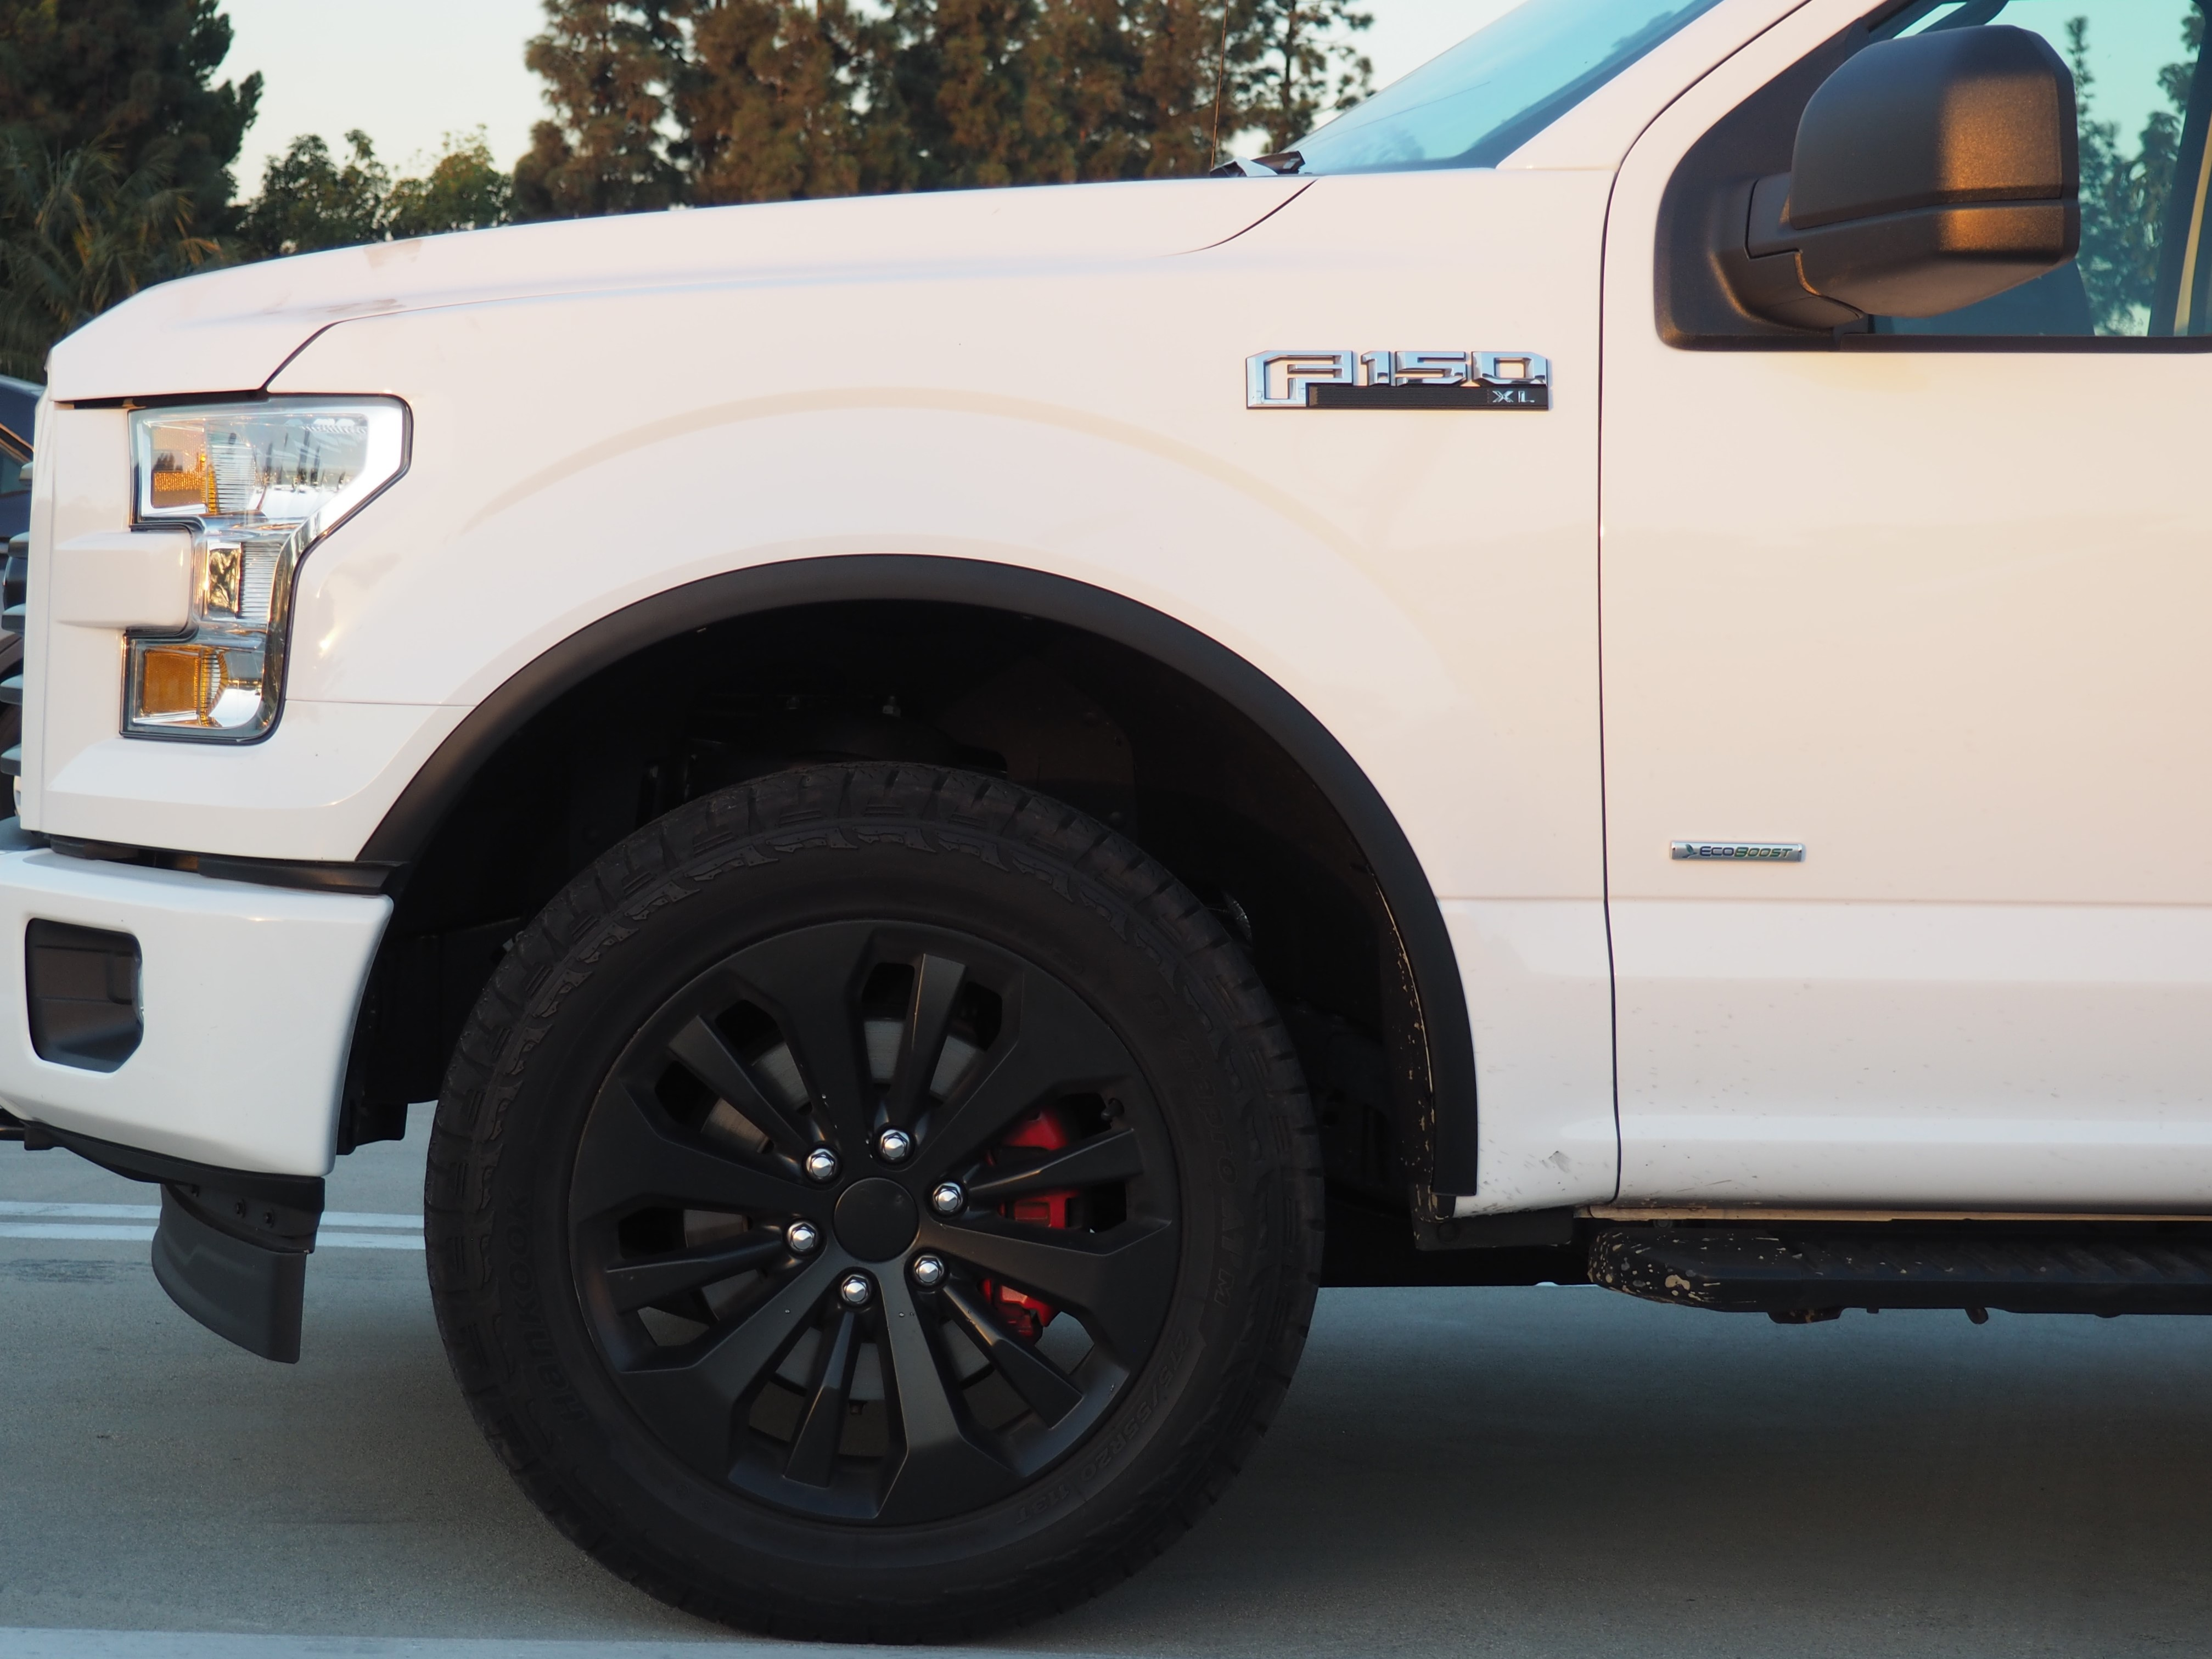 2018 Ford F150 Interior >> 2015 2016 2017 F150 F-150 TRUCK MATTE BLACK FENDER FLARE WHEEL WELL MOLDING TRIM | eBay